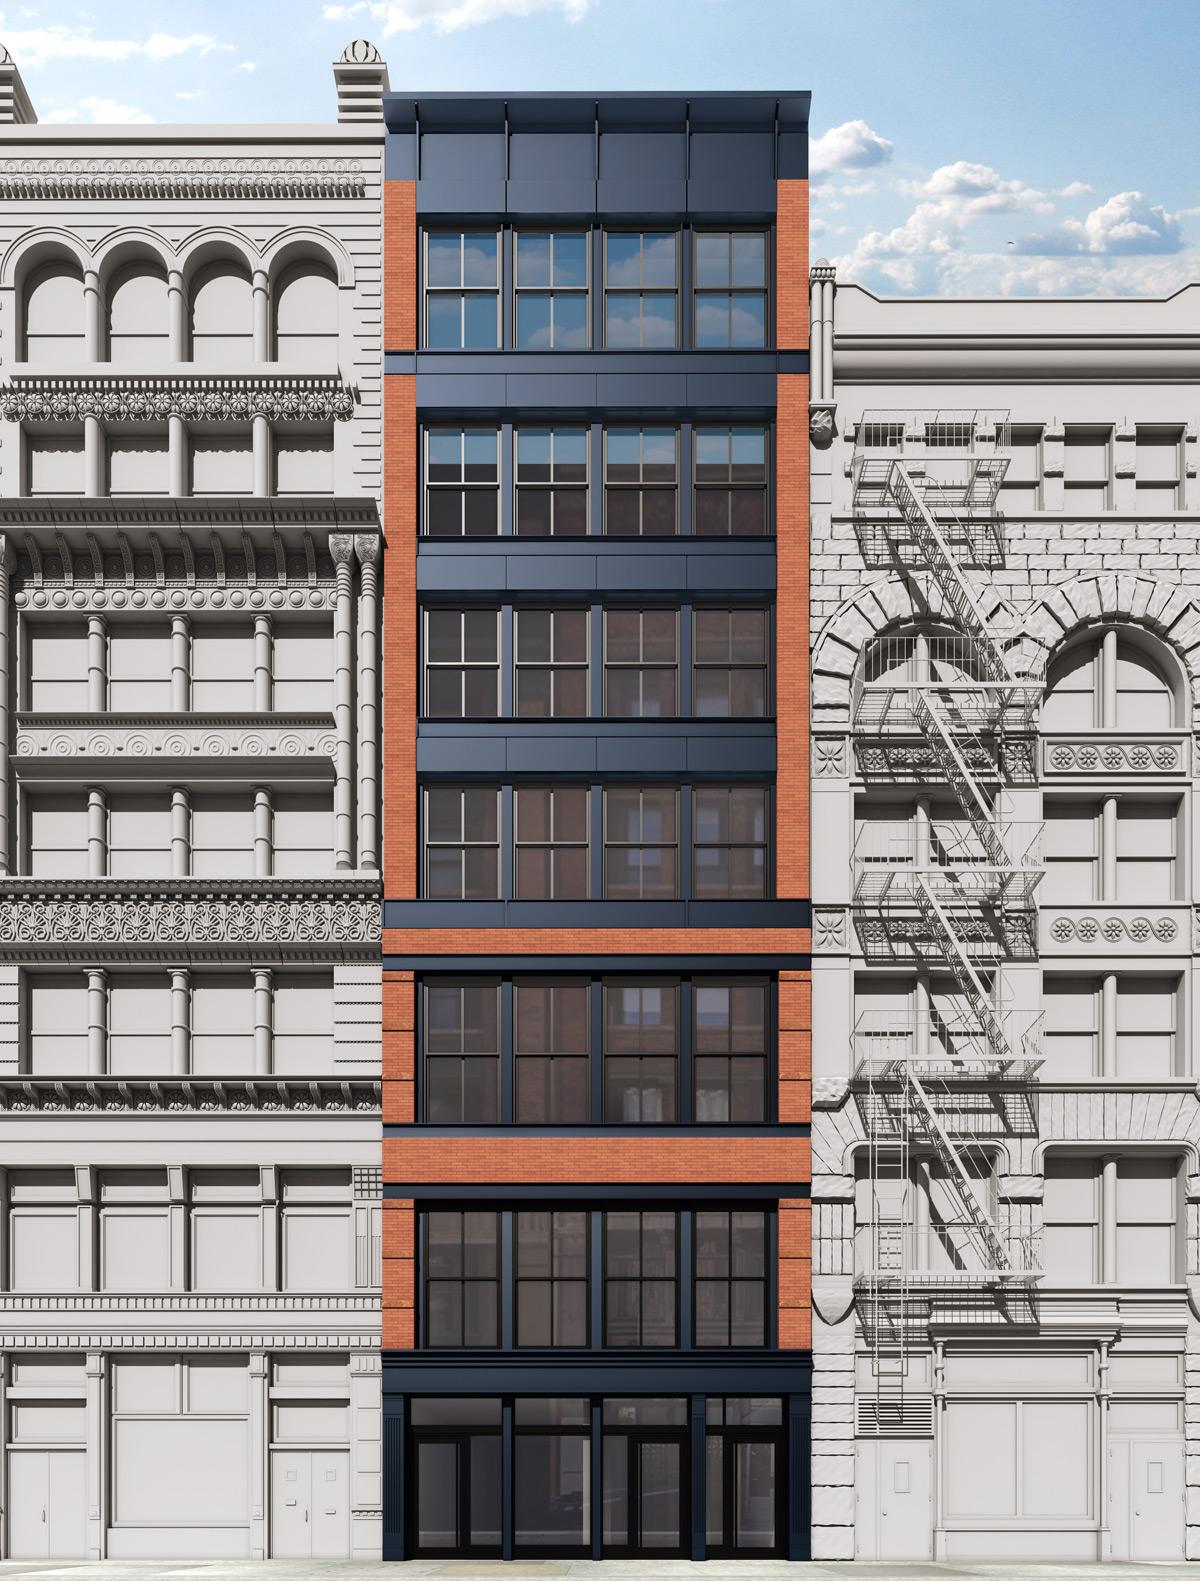 45 Great Jones, rendering by Kim Wendell Design